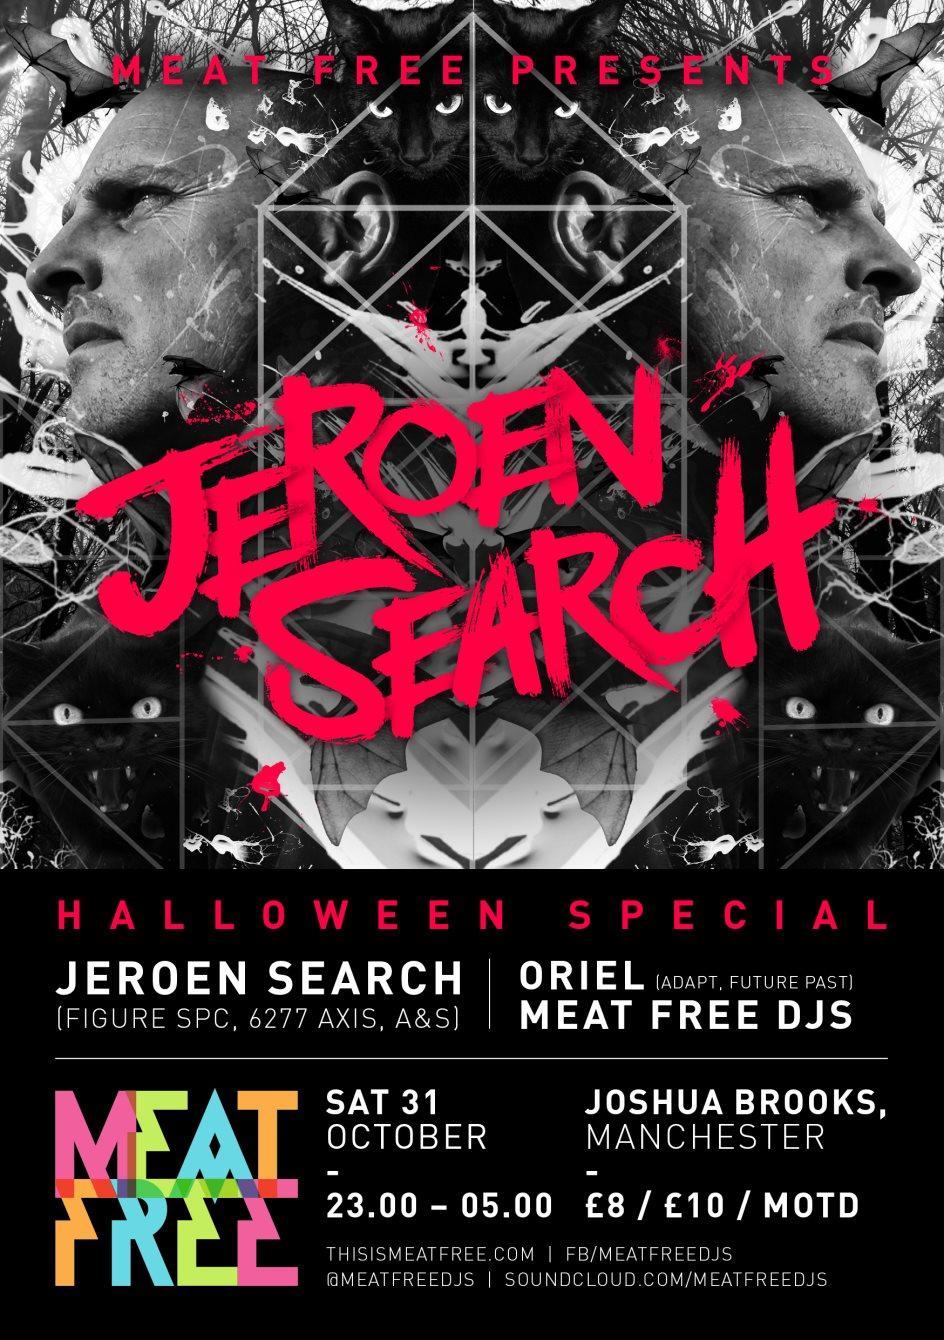 Meat Free presents Jeroen Search - Flyer front